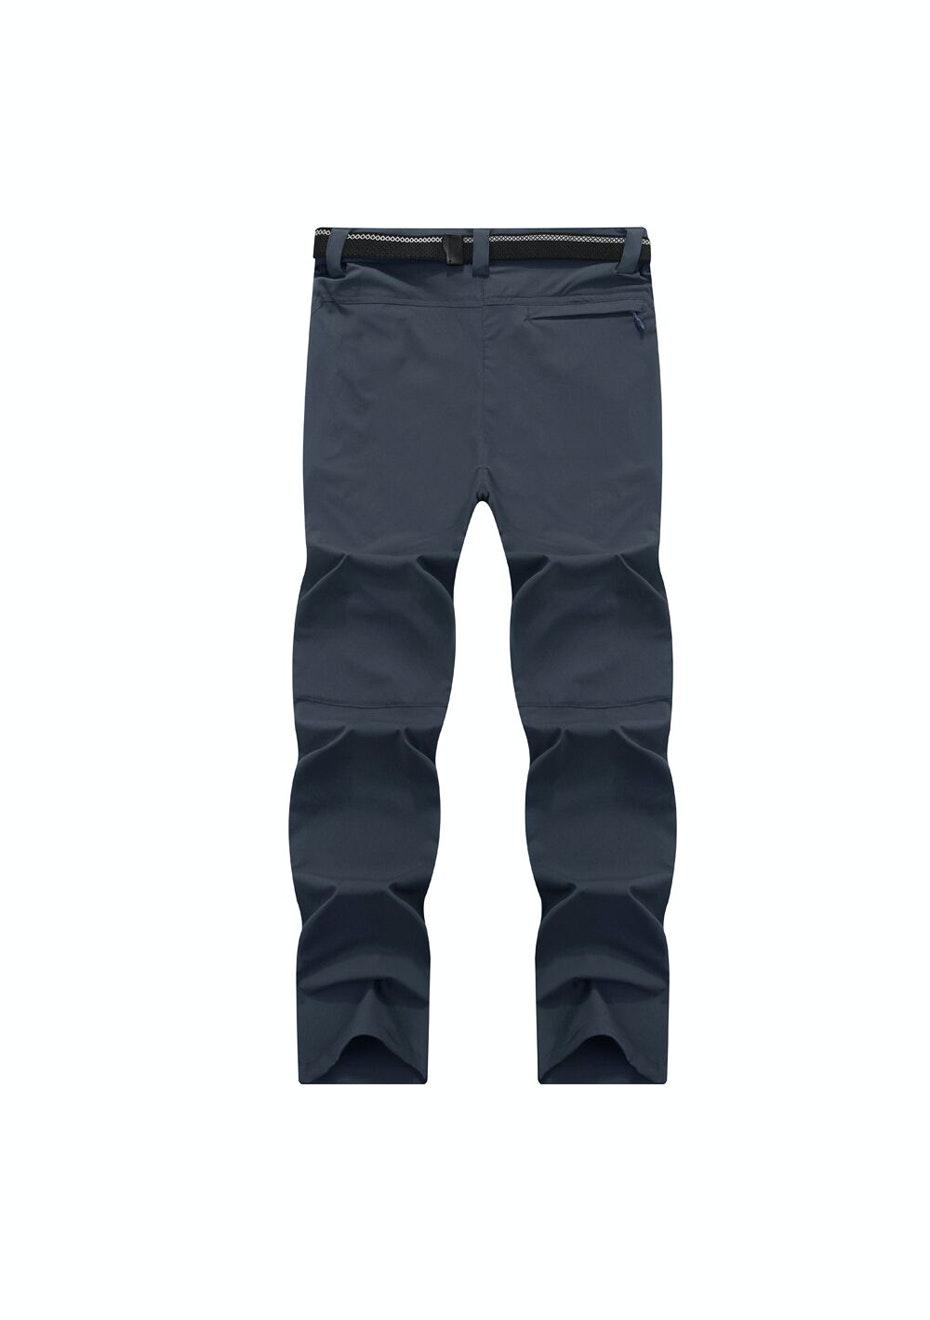 Men 2-in-1 WaterProof Pants - Charcoal